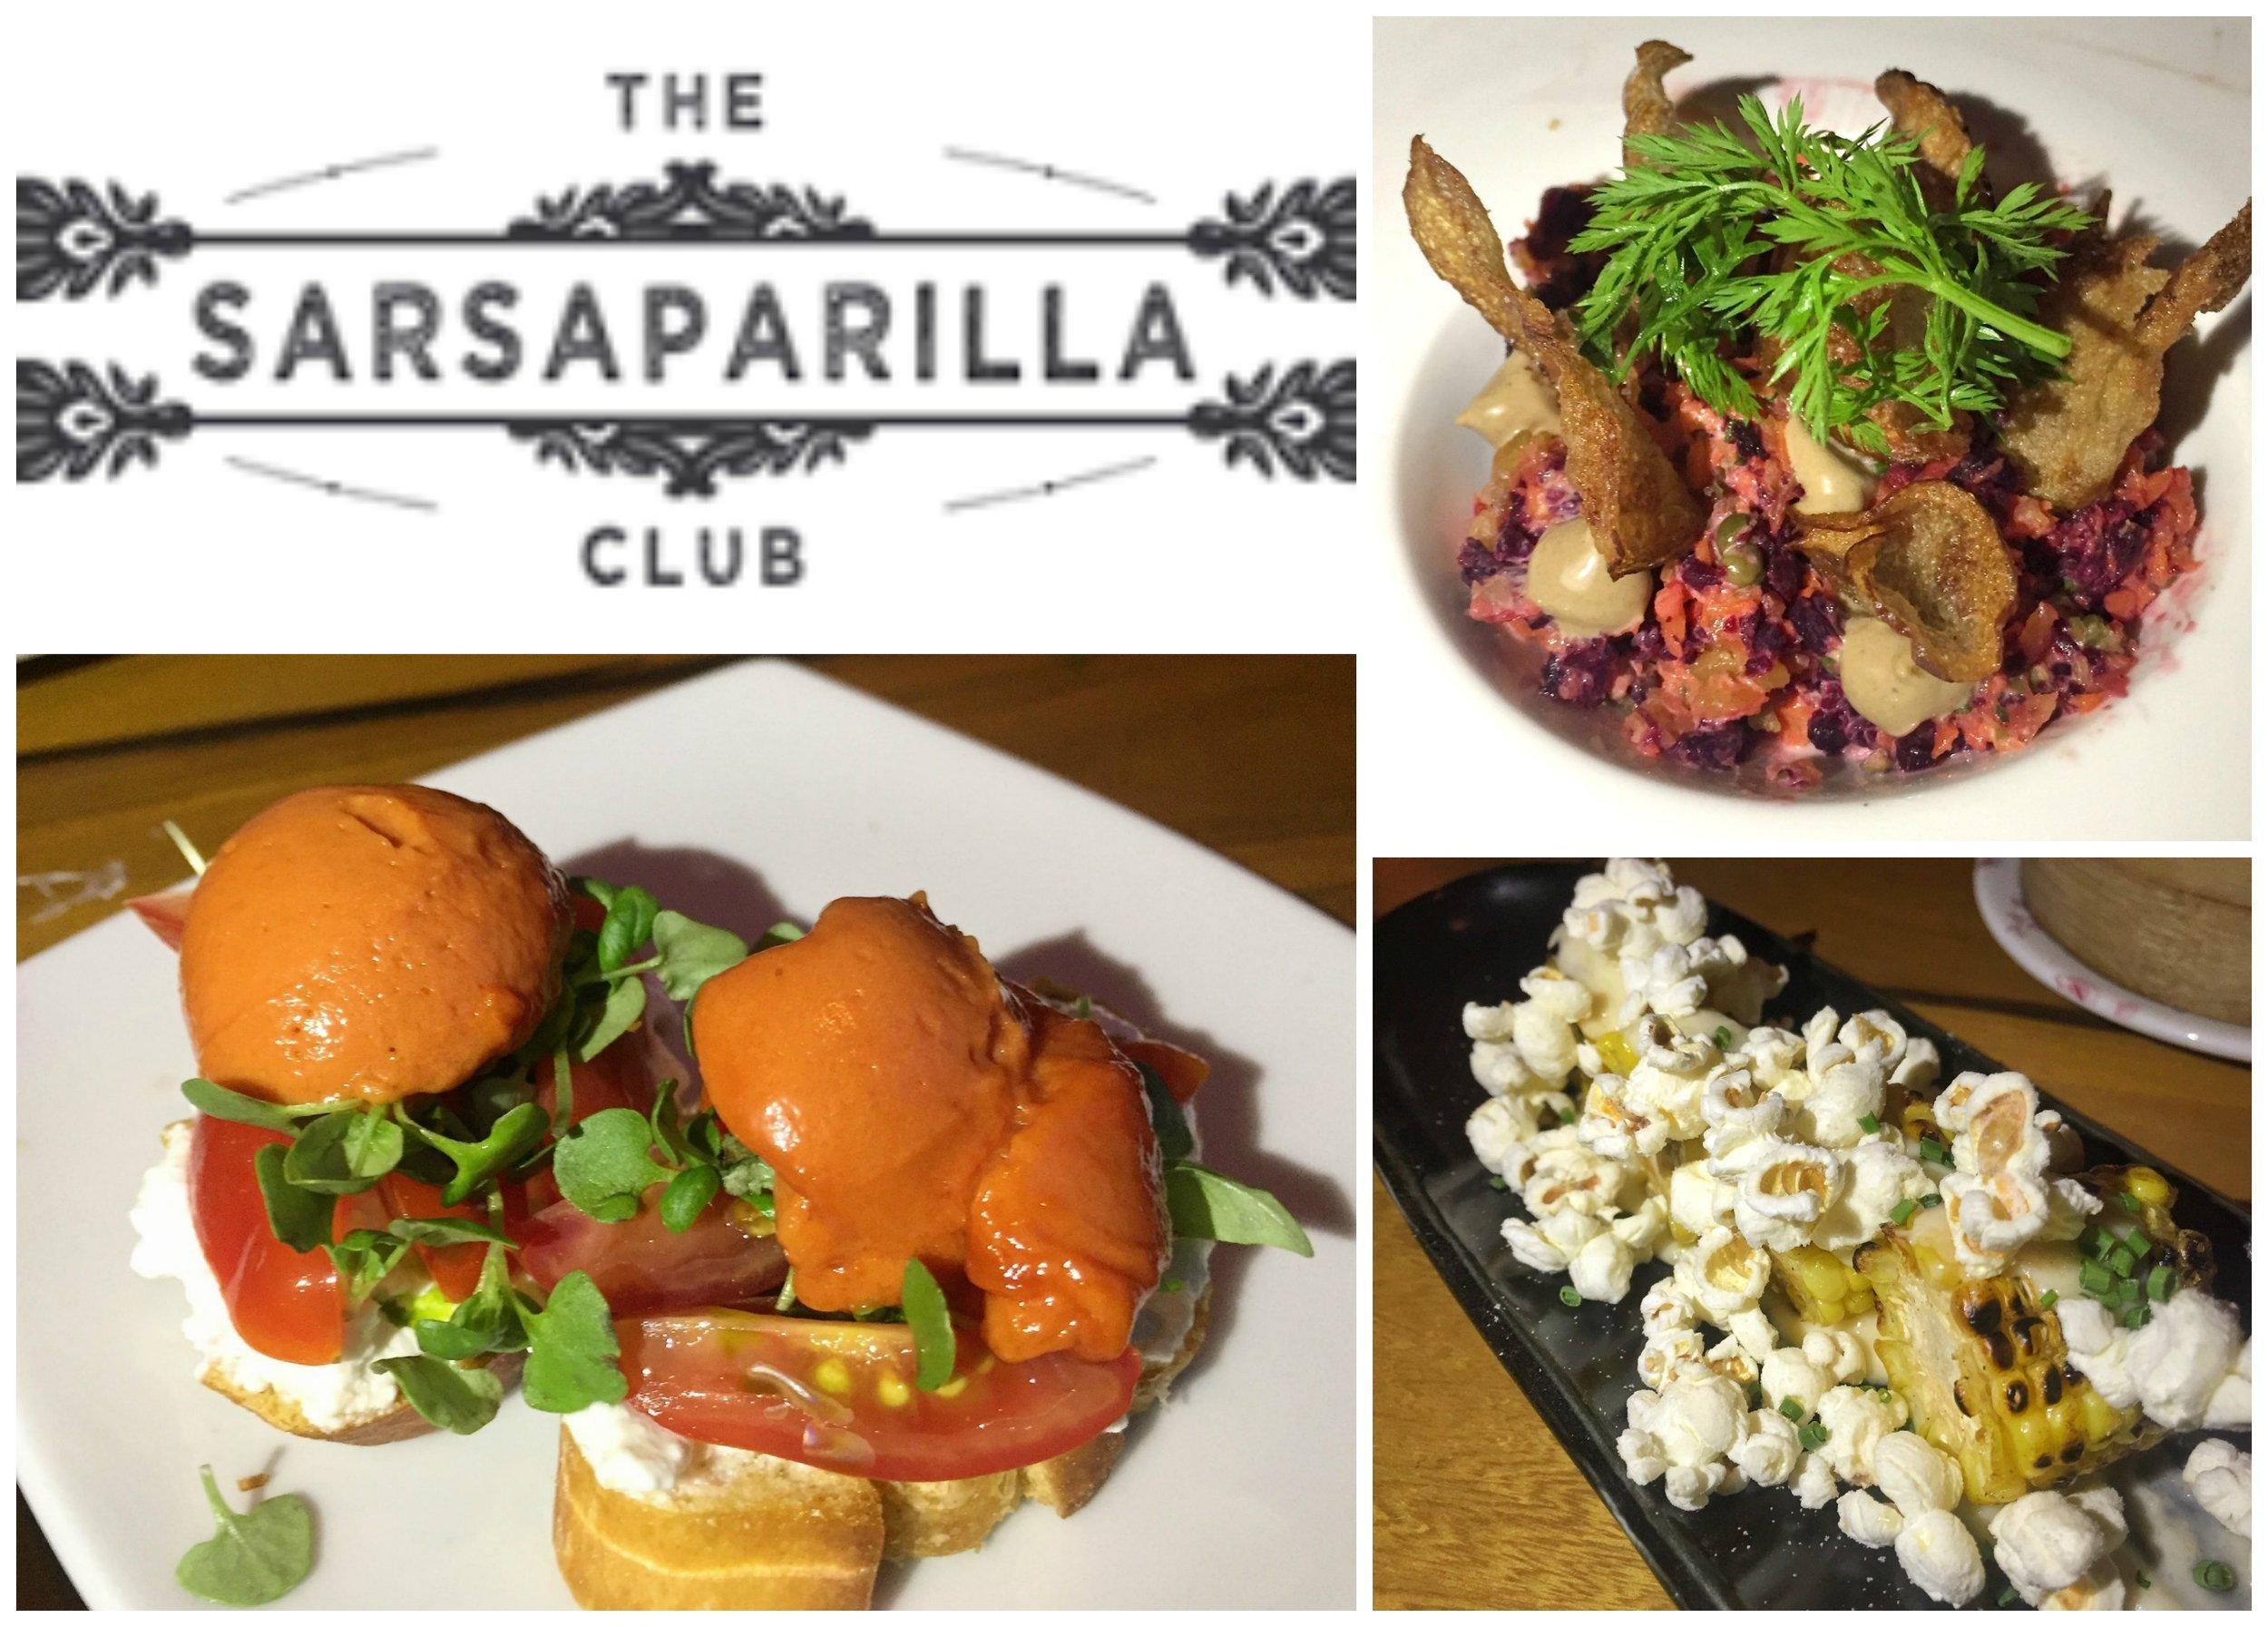 Sarsaparilla Club Chef Tasting Menu